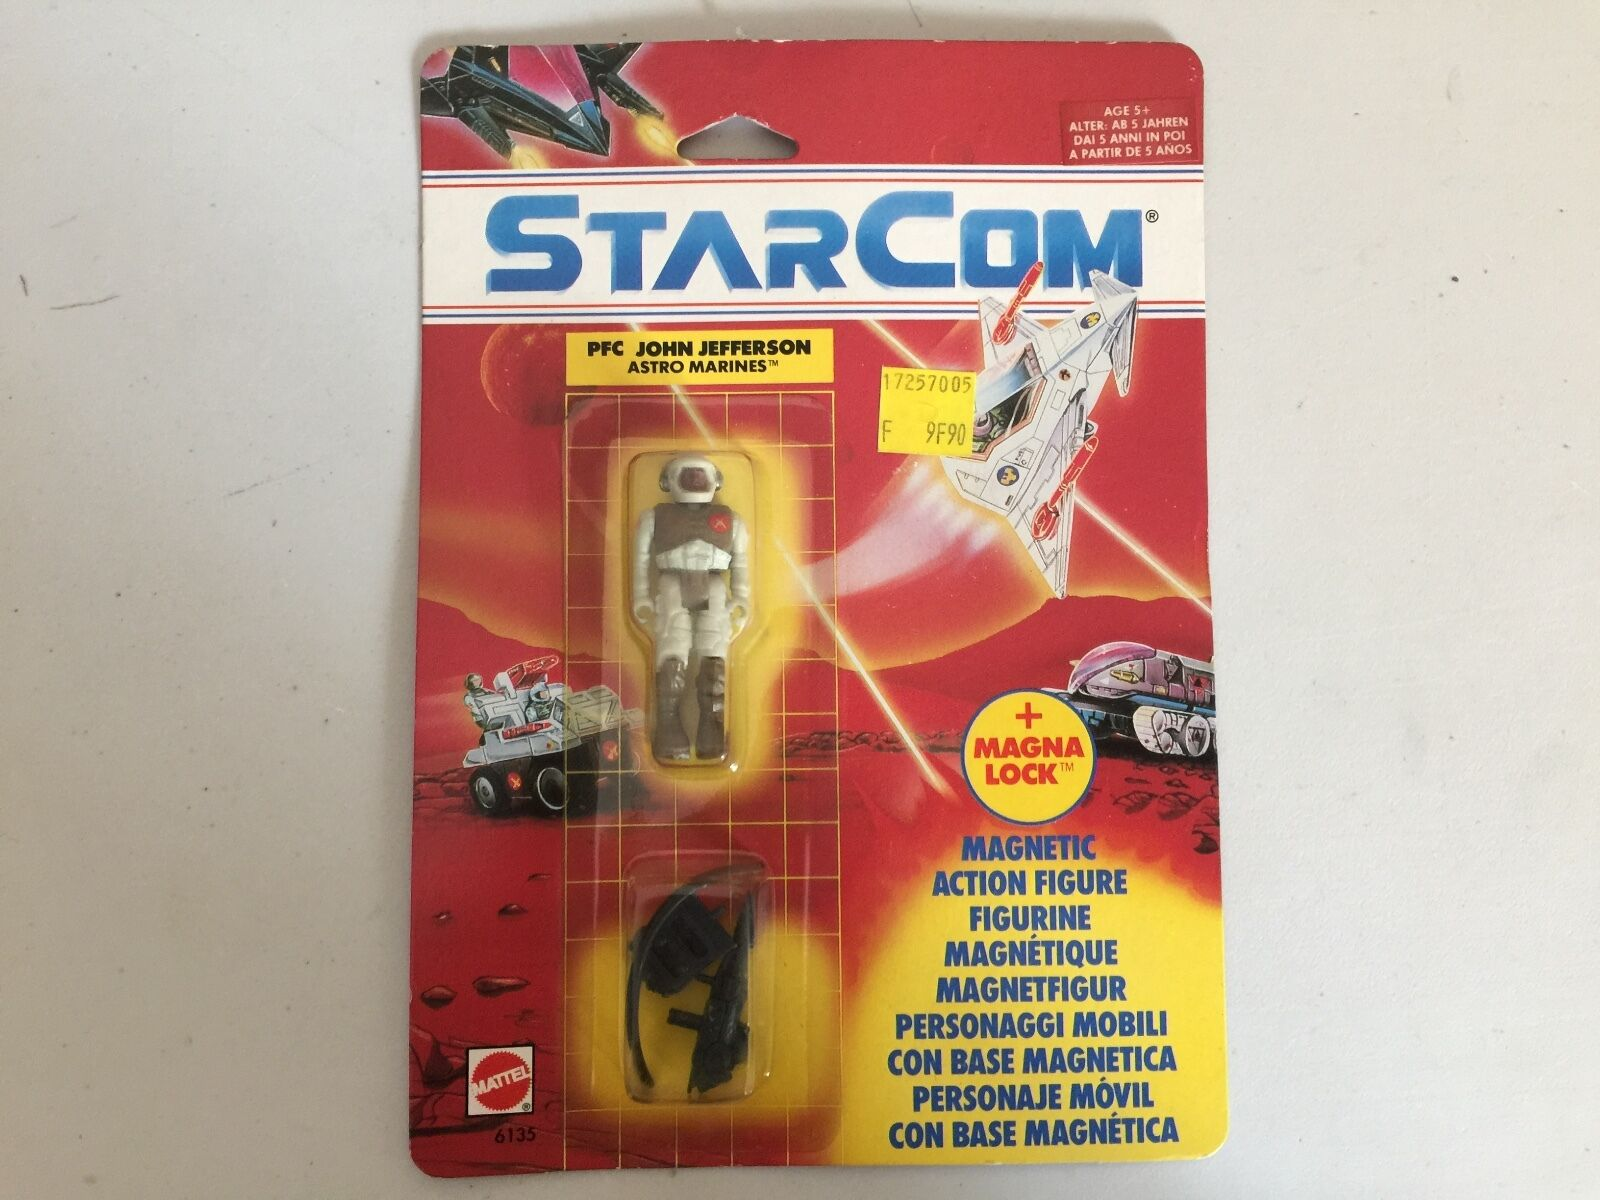 STARCOM Pfc. John JEFFERSON figure MOSC new Mattel european mint